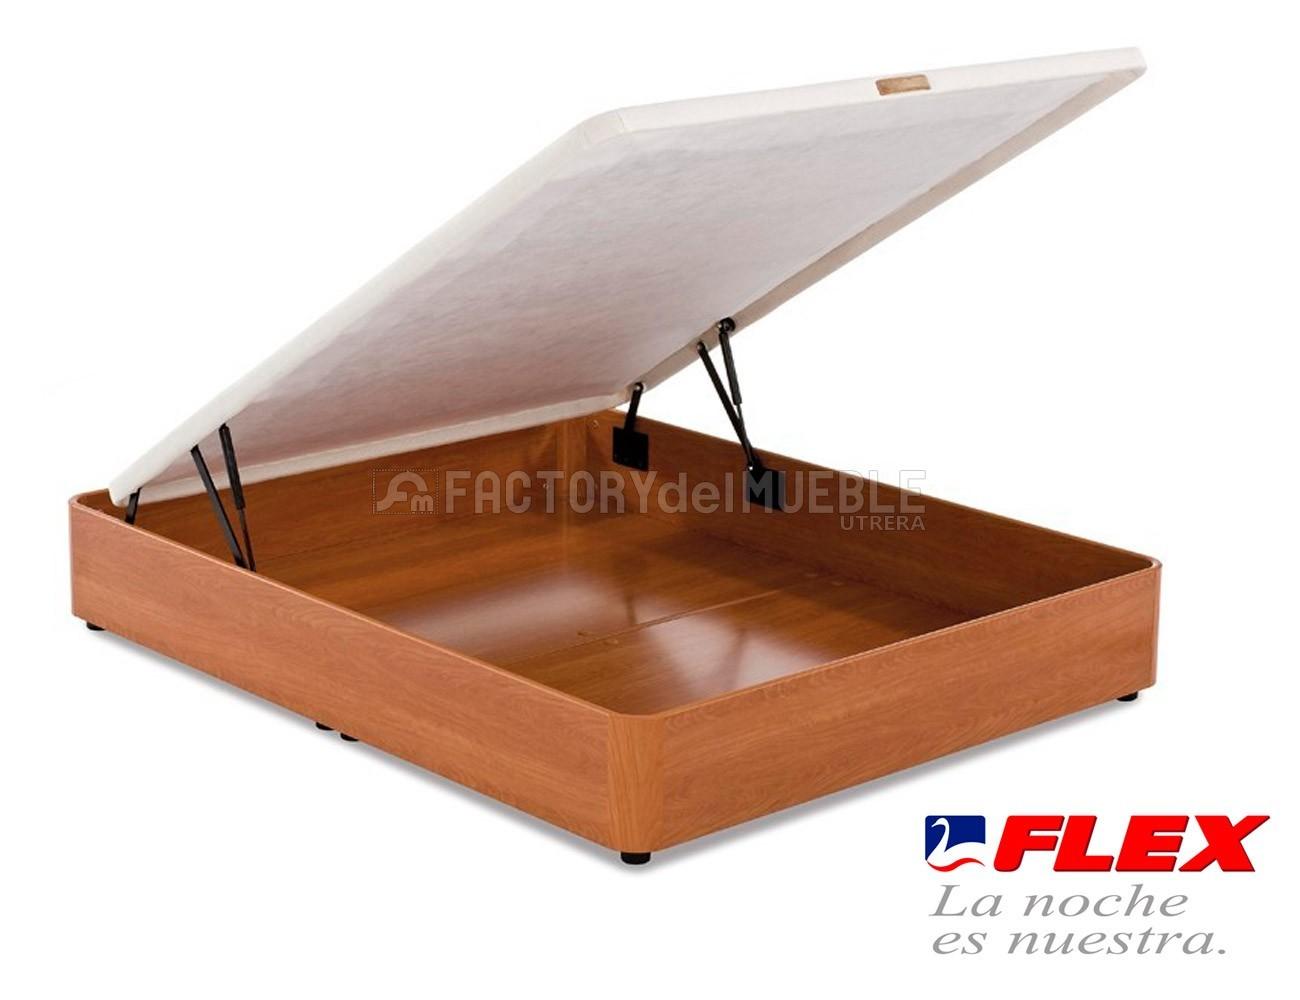 Canape flex madera sistema desplazamiento1